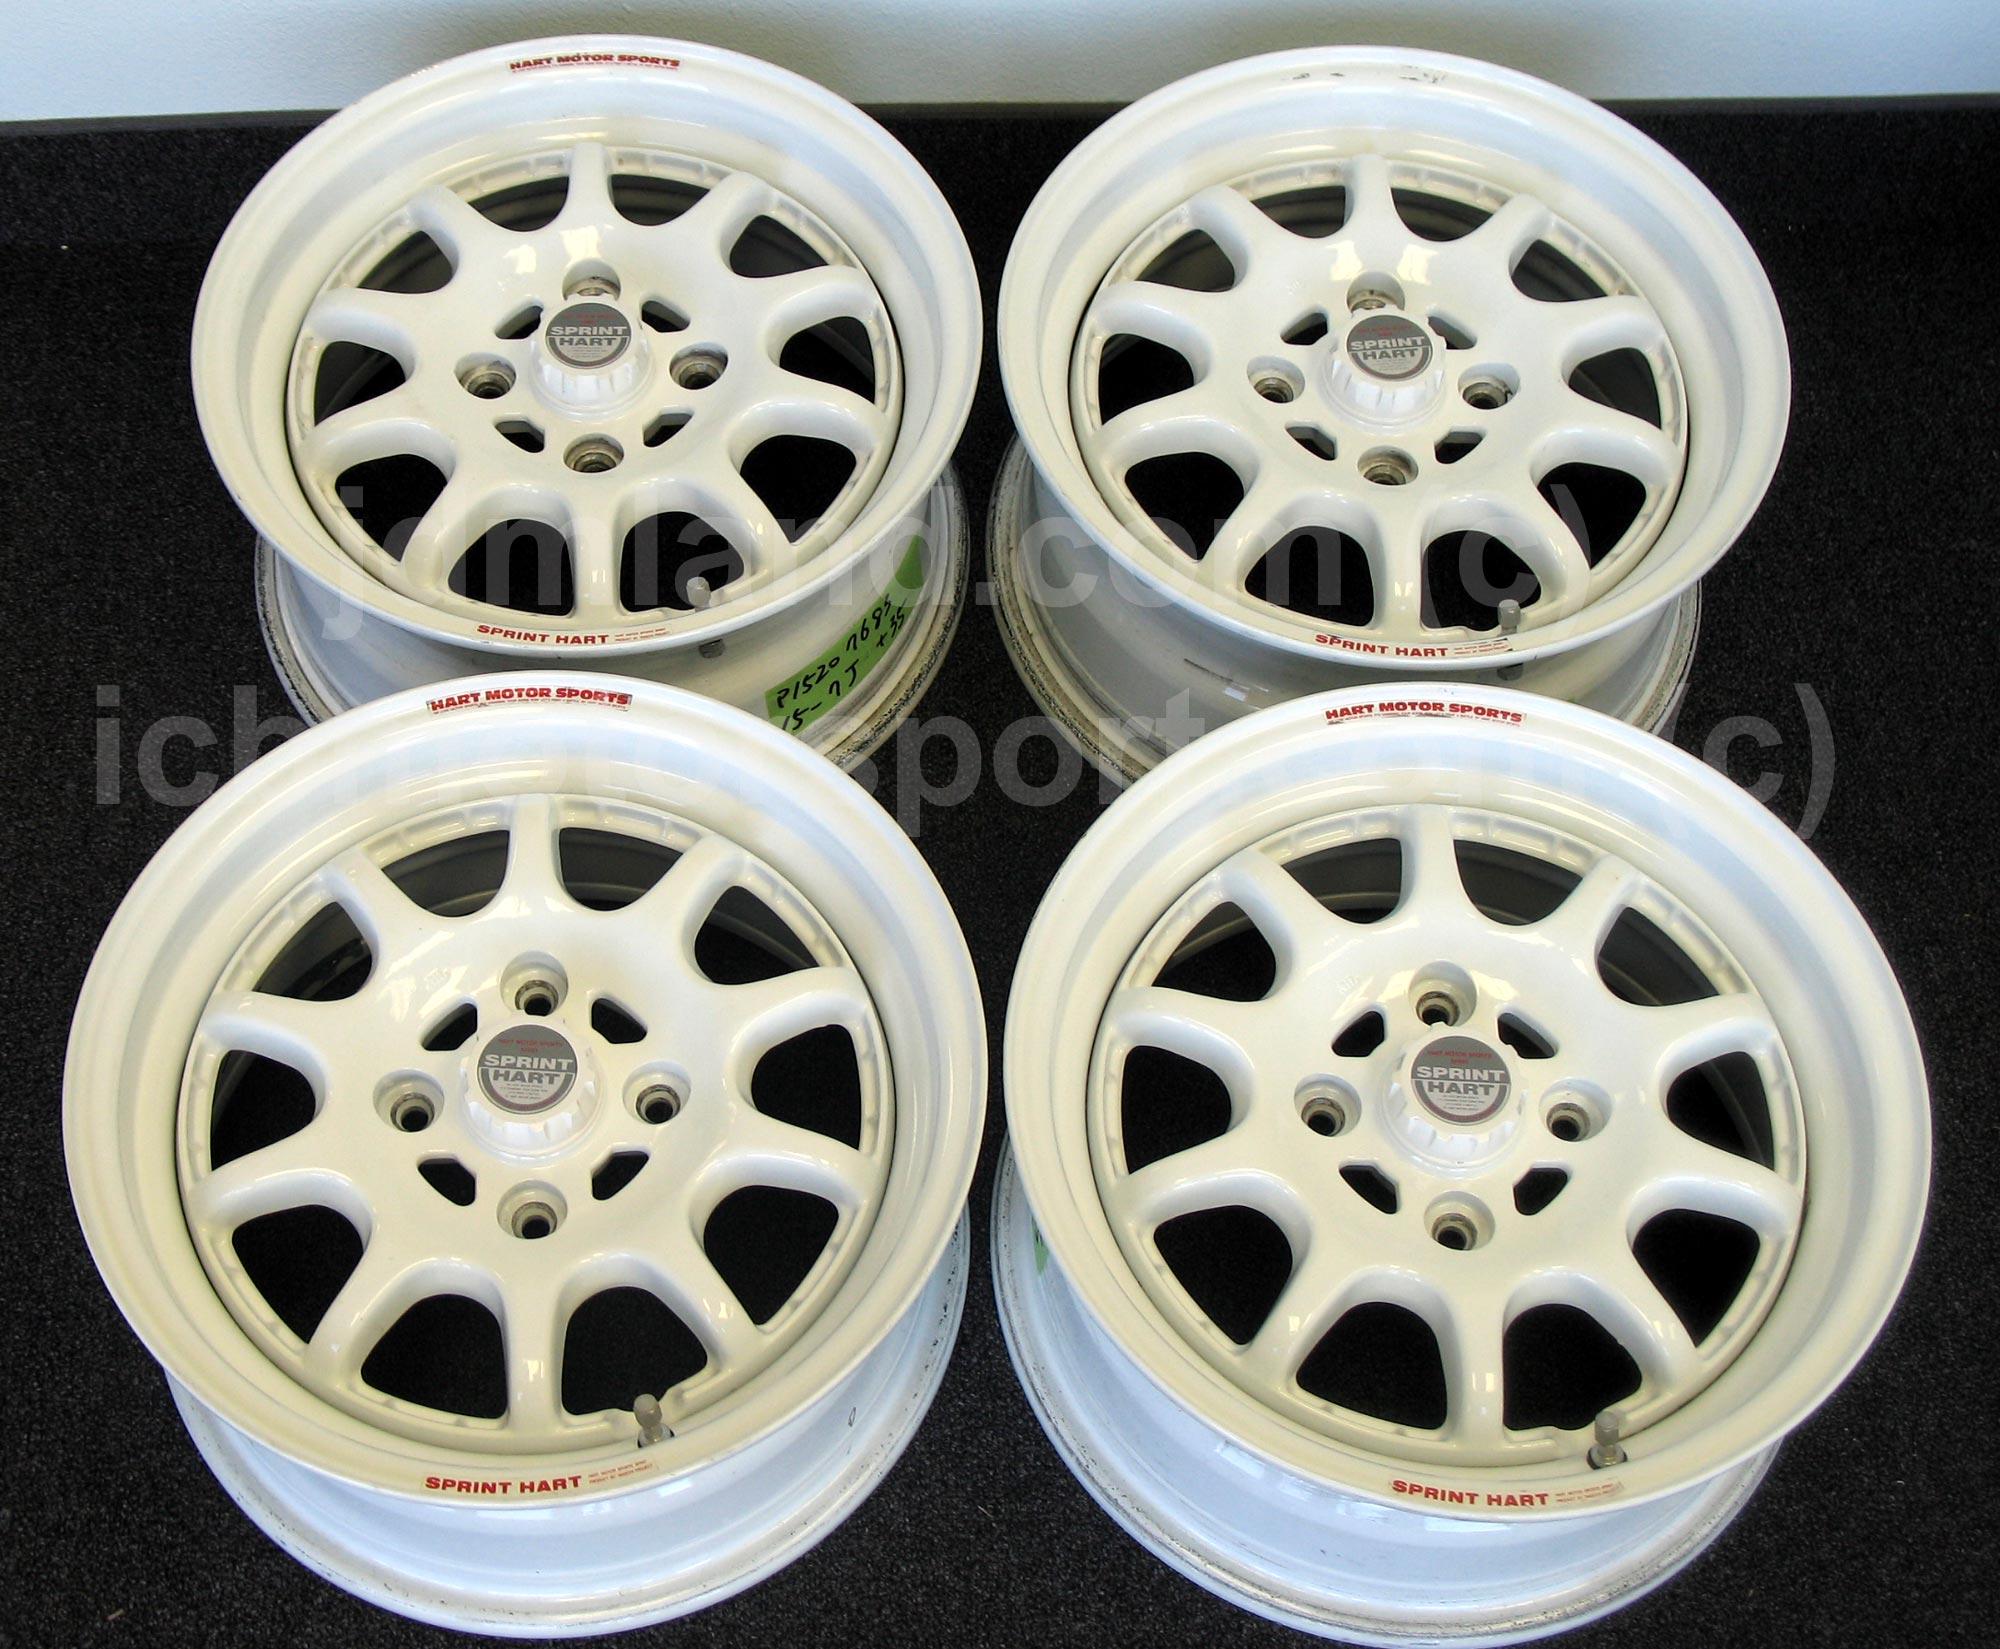 Sprint Hart Wheels